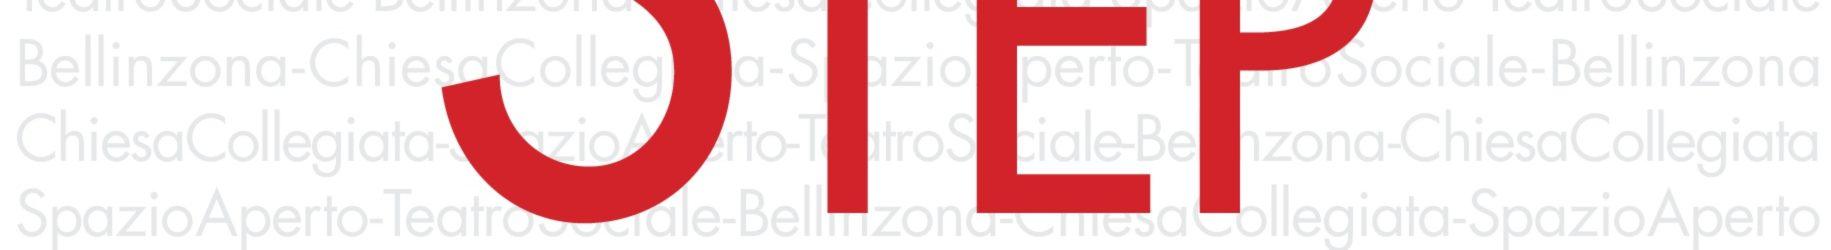 L'ESTRO ARMONICO 2019